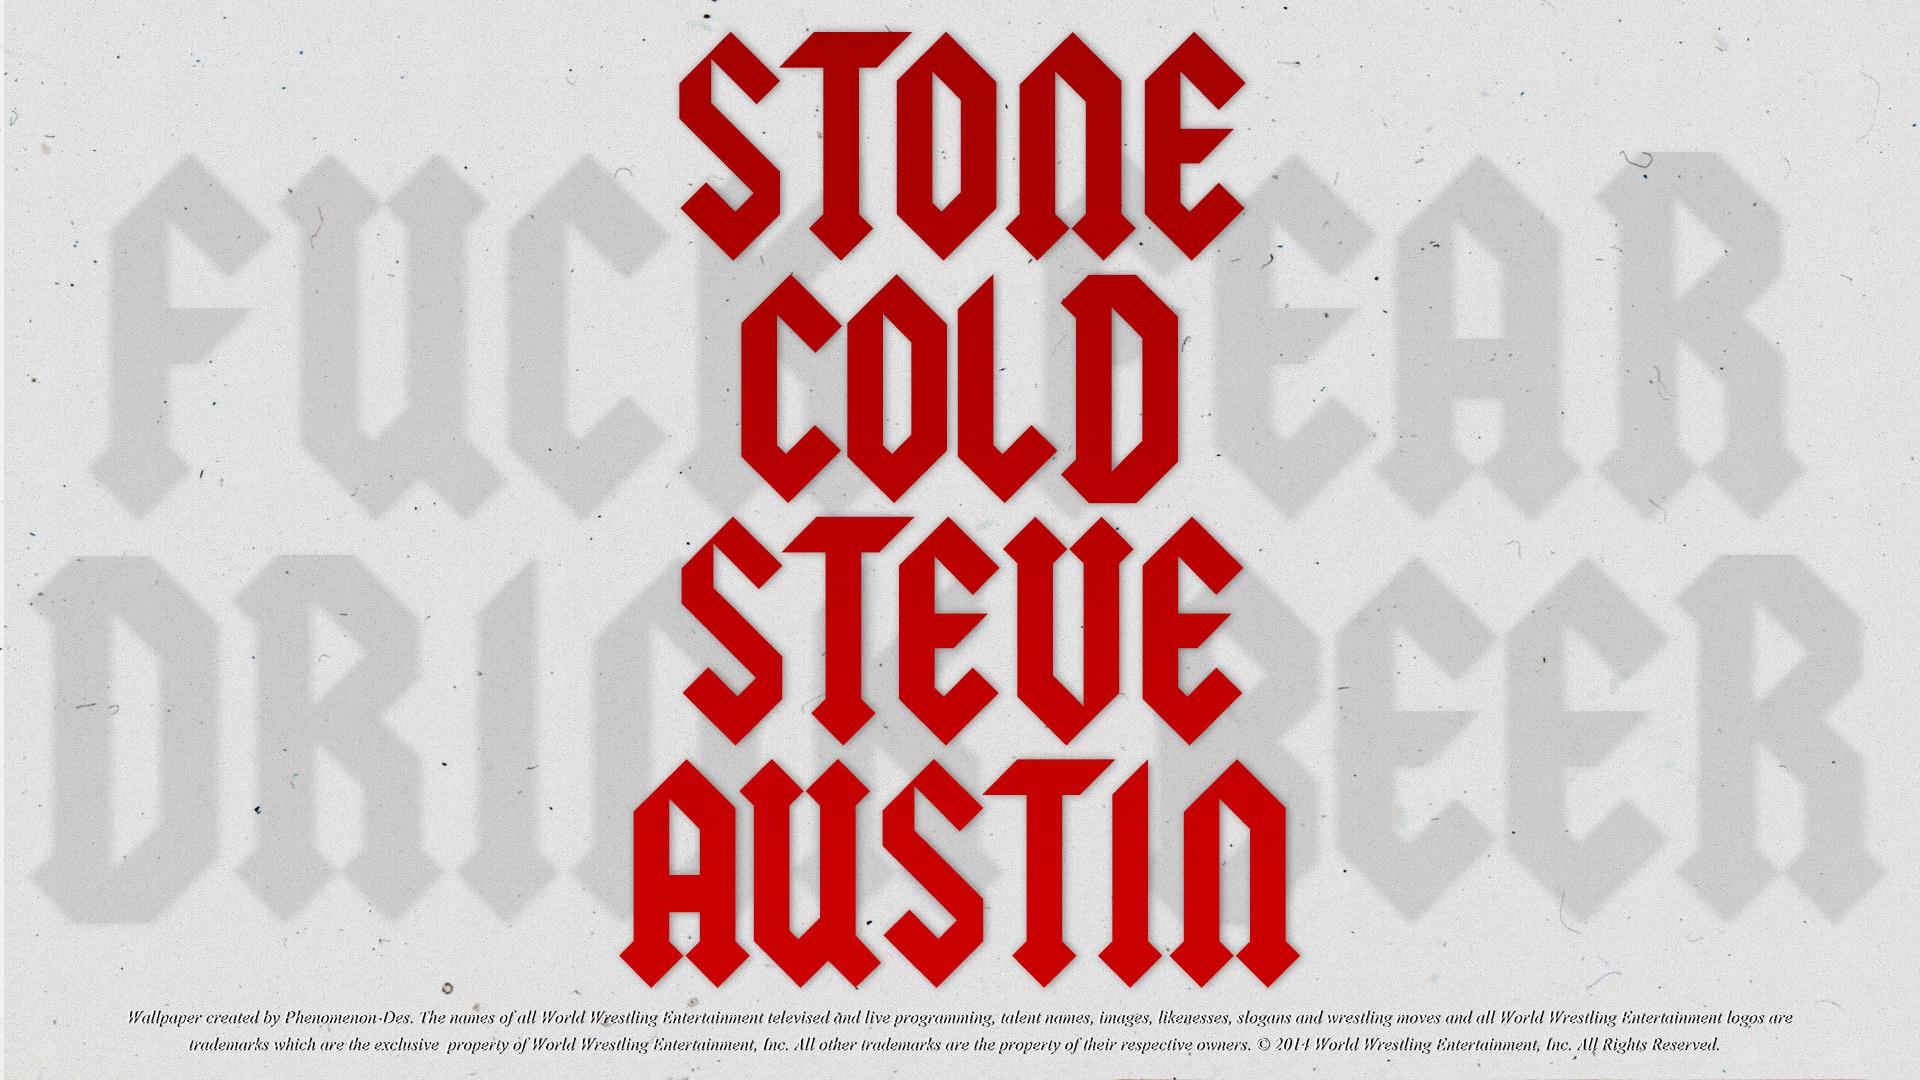 Wwe Stone Cold Steve Austin Wallpaper By Phenomenon Des On Deviantart